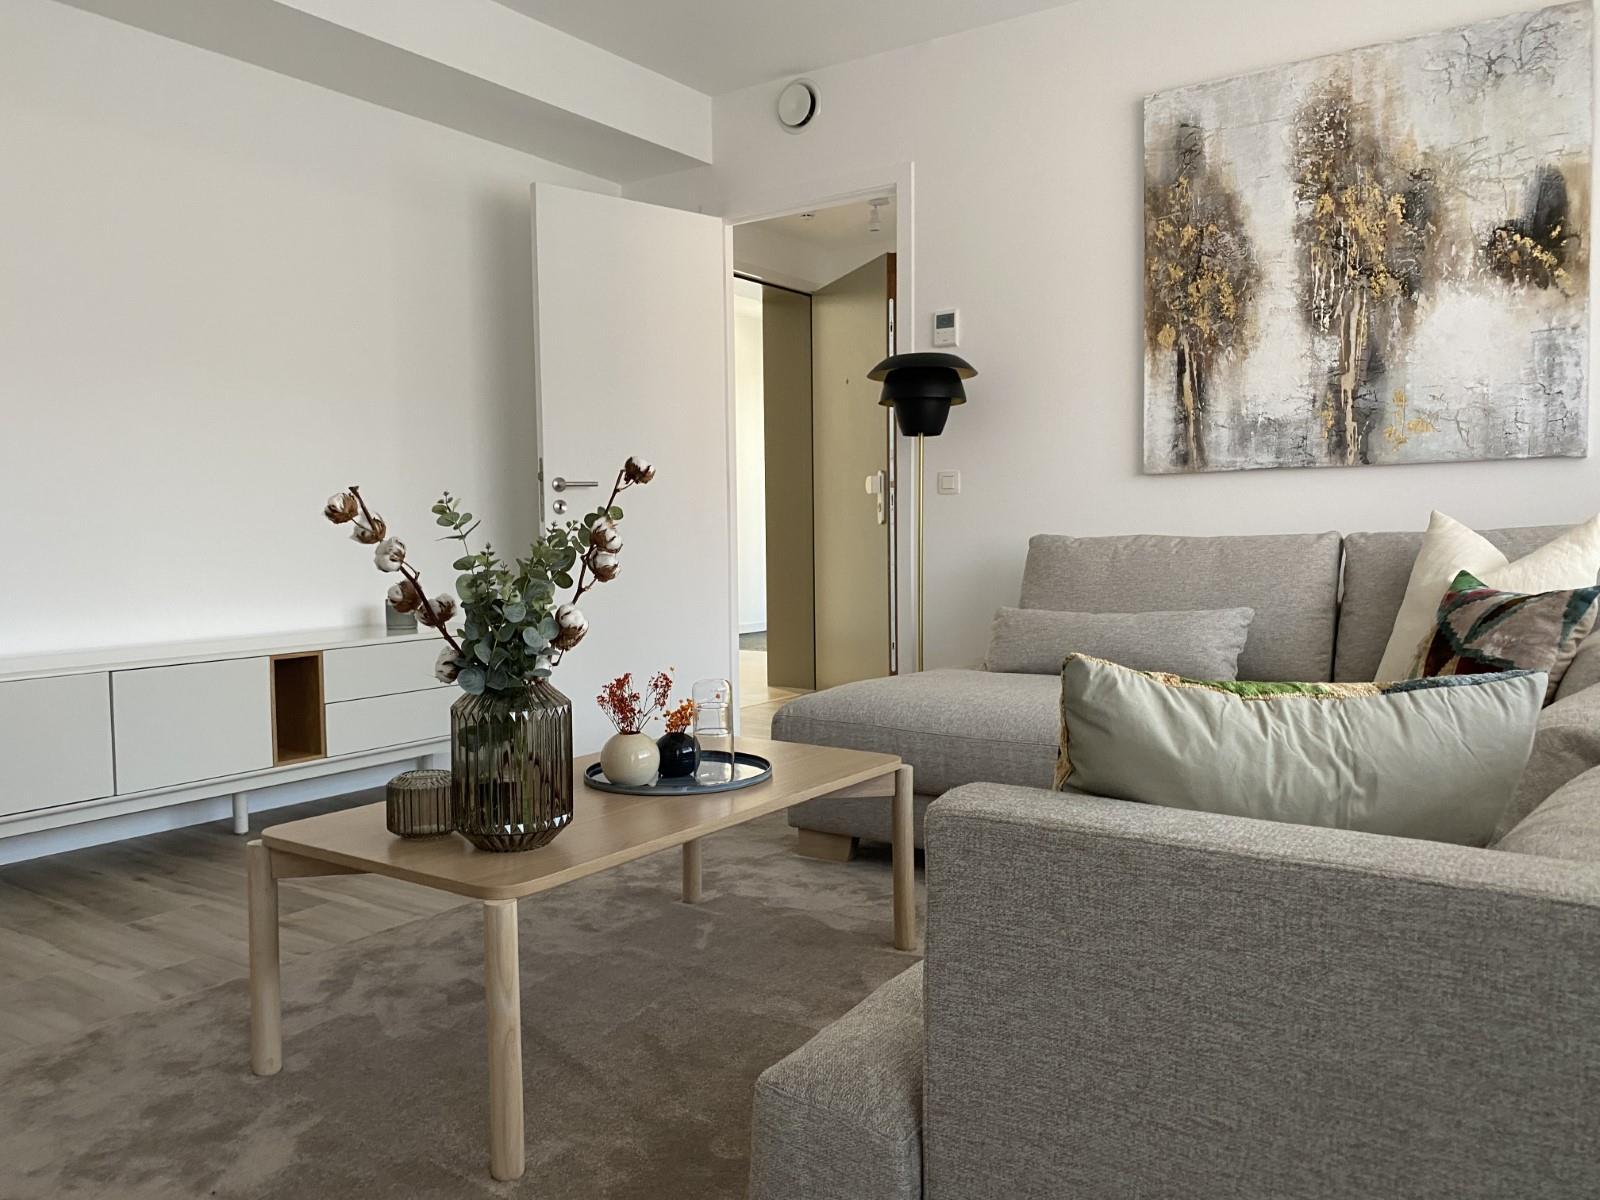 Appartement - Woluwe-Saint-Lambert - #4118059-1